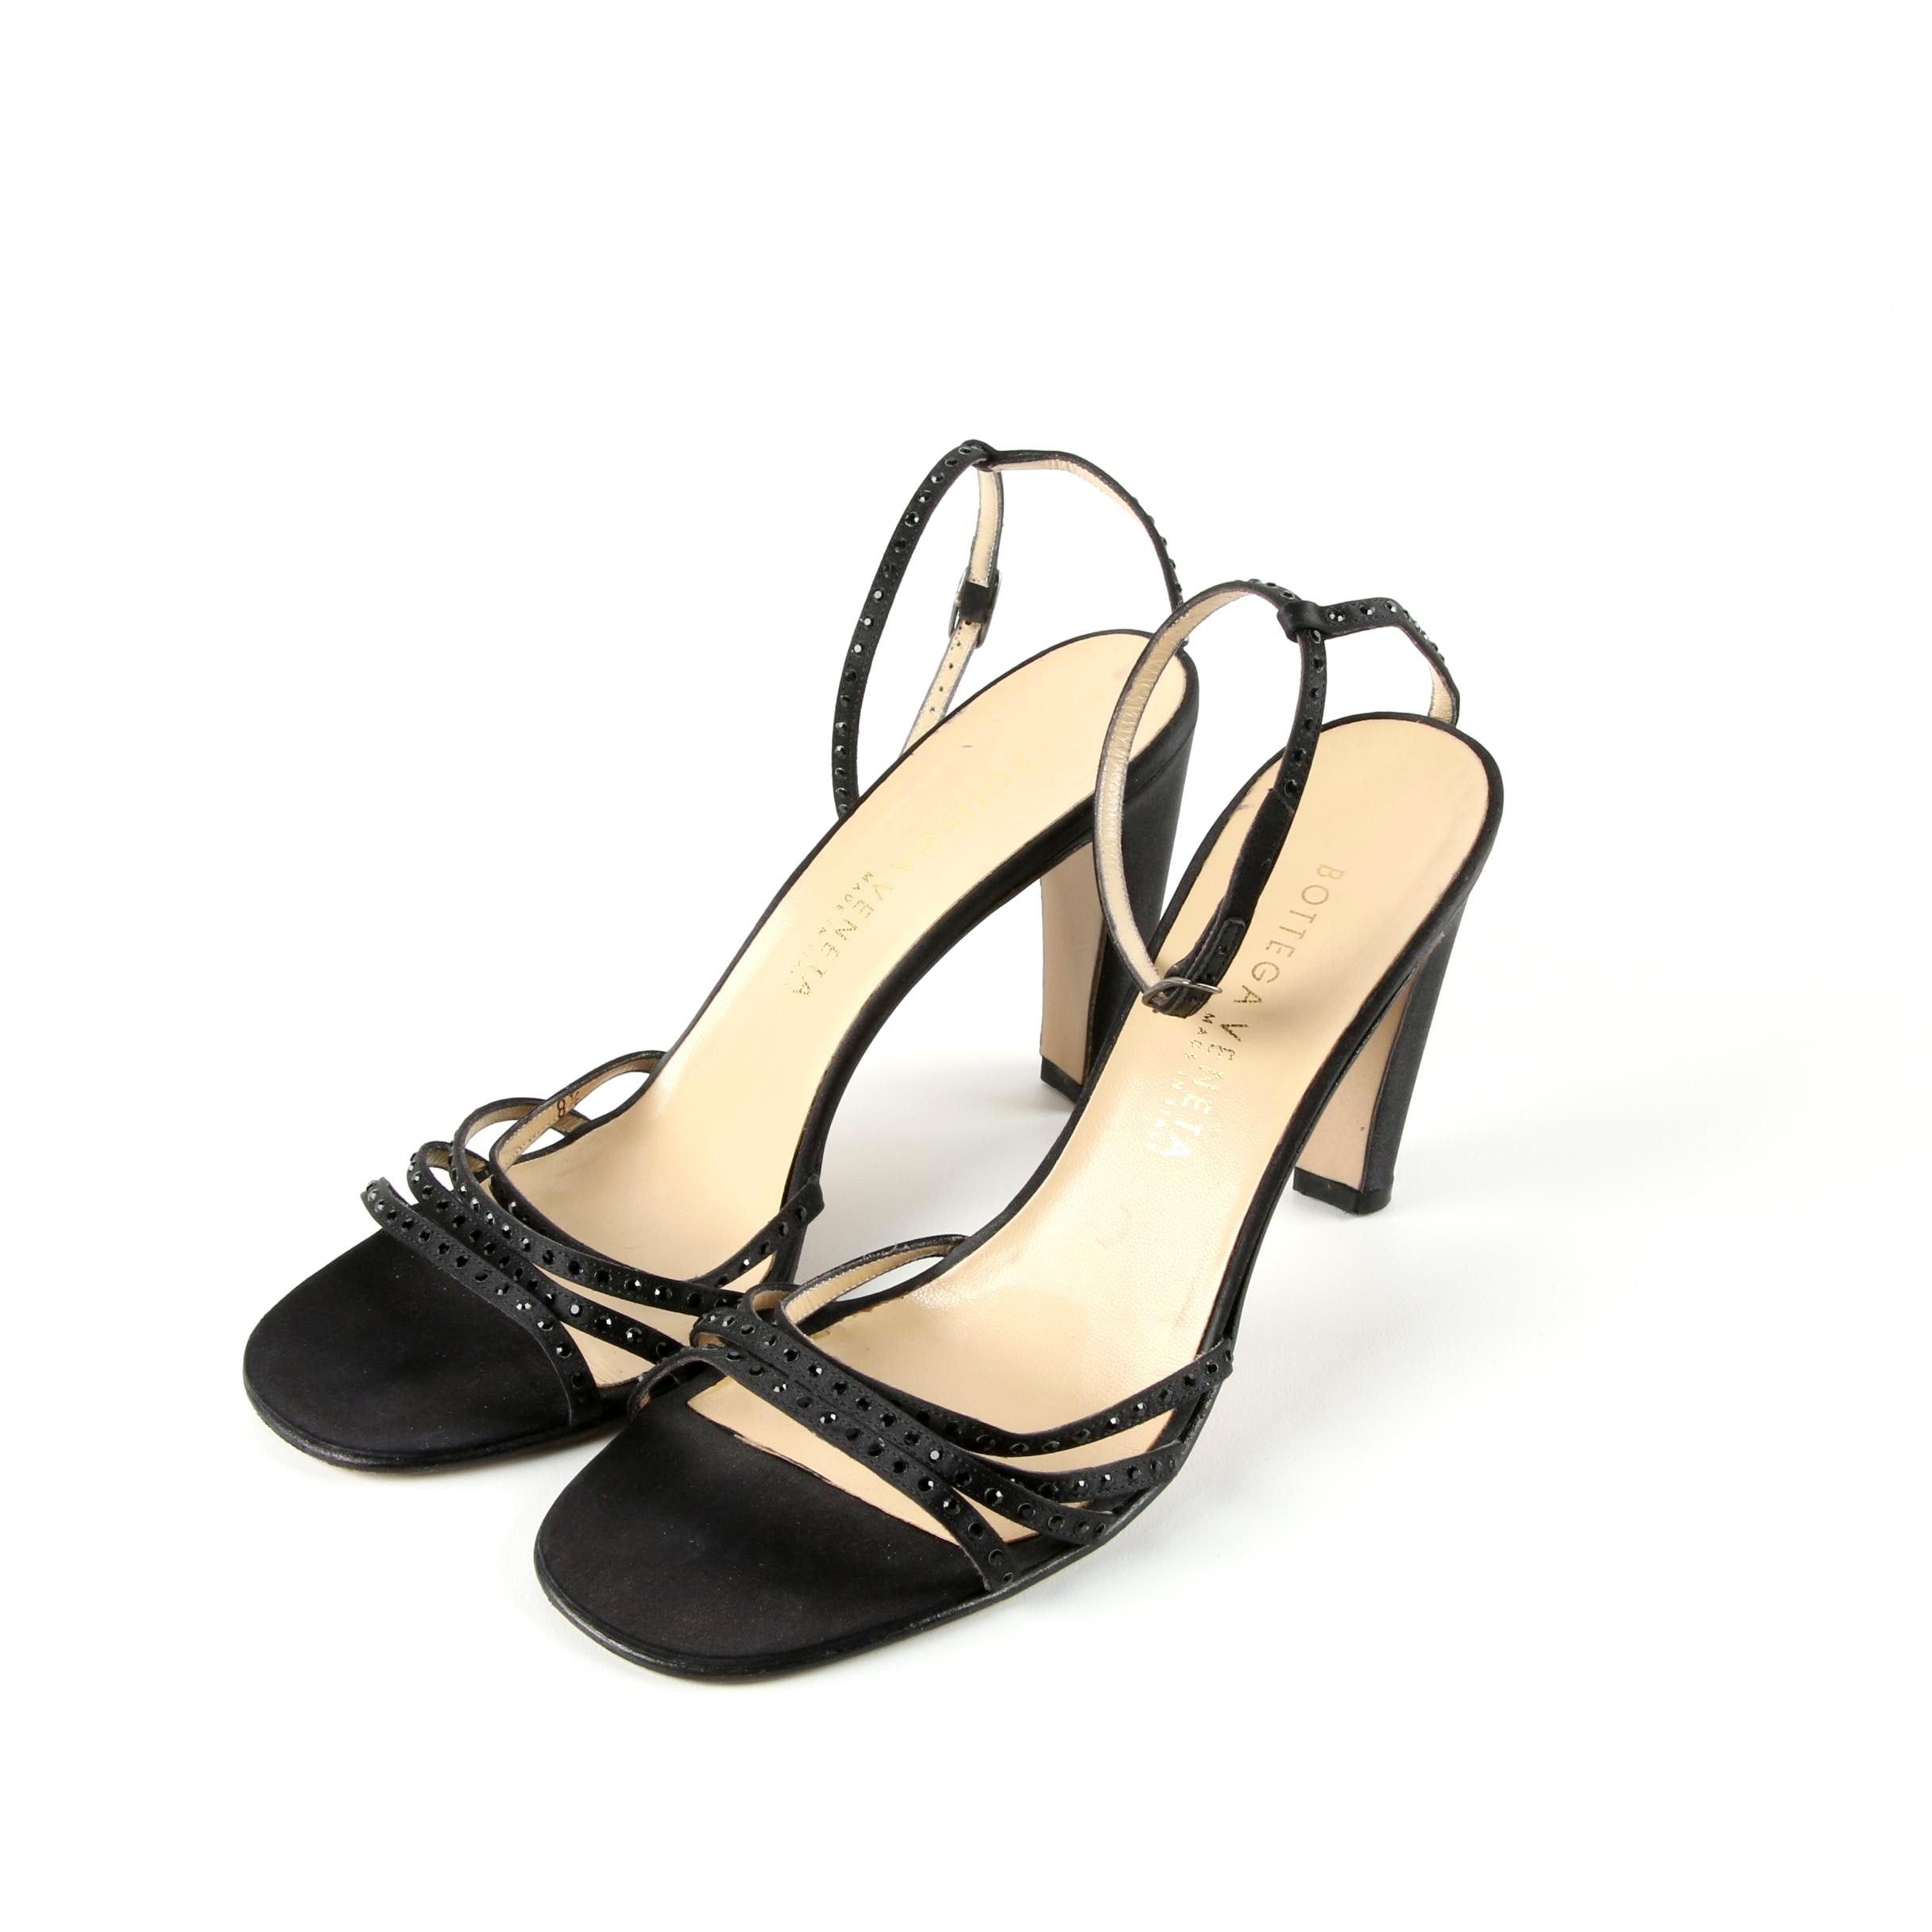 Bottega Veneta Black Satin and Rhinestone Dress Sandals, Made in Italy